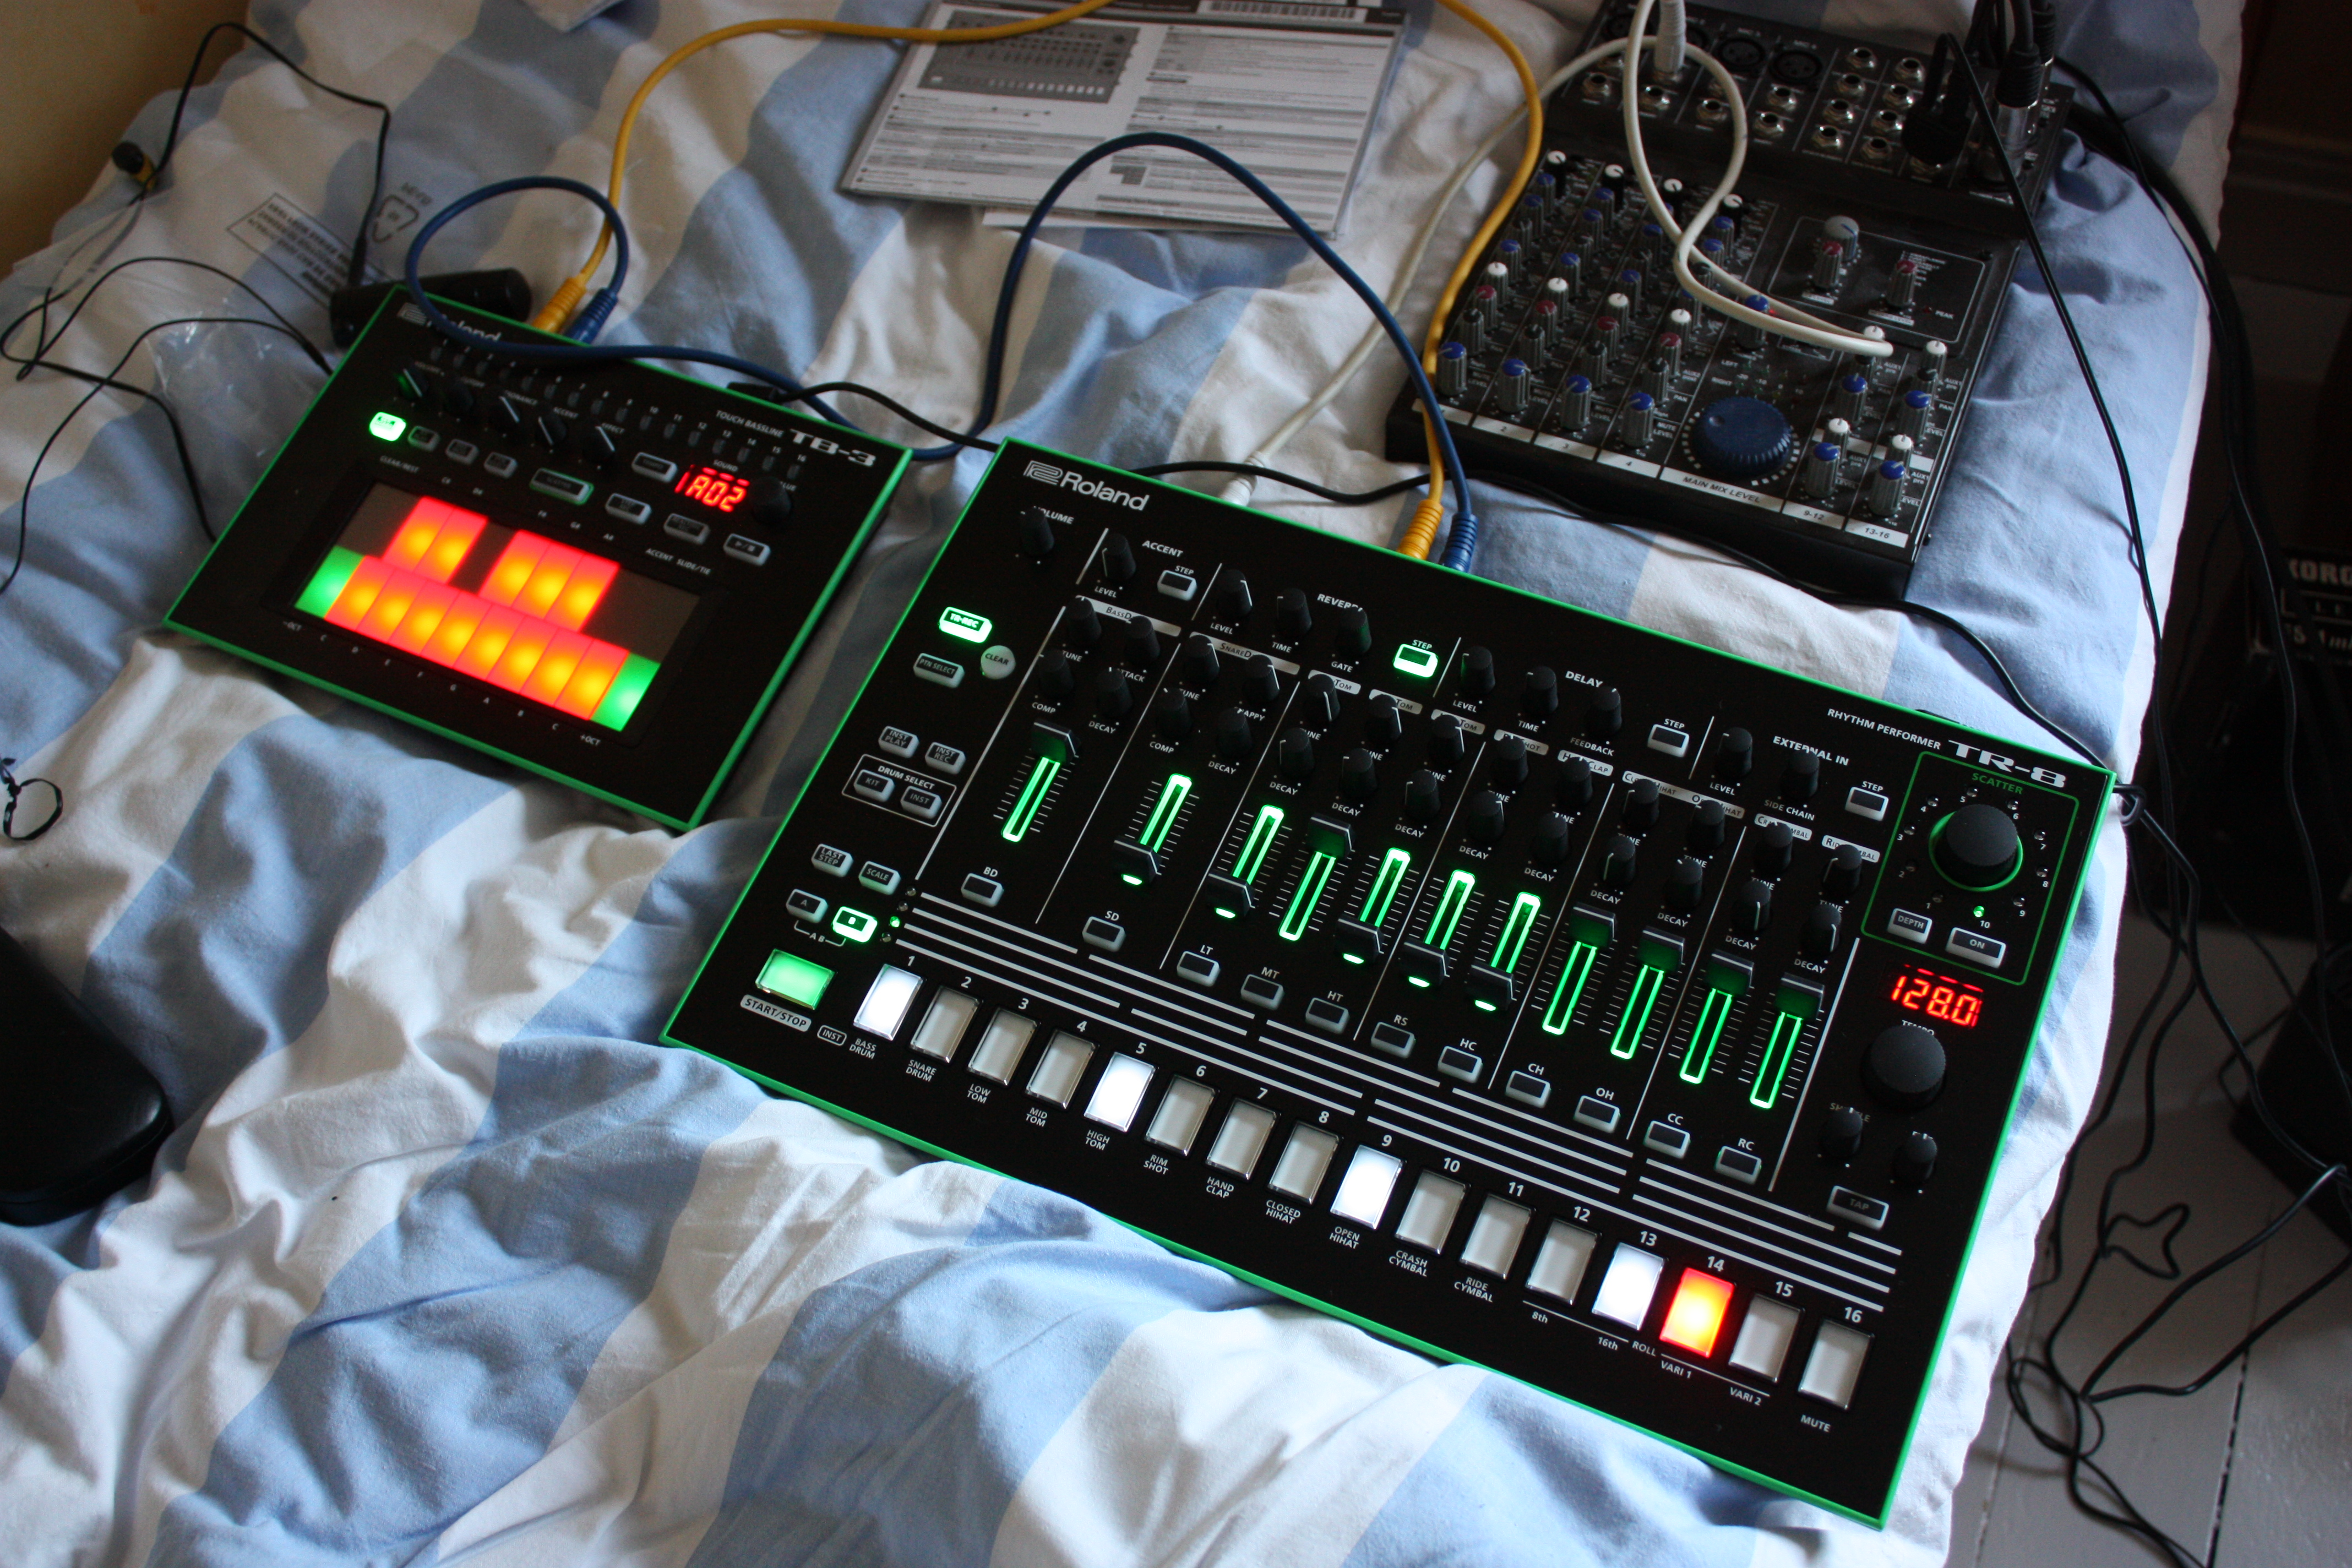 file roland aira tr 8 rhythm performer roland aira tb 3 touch bassline by david j jpg. Black Bedroom Furniture Sets. Home Design Ideas